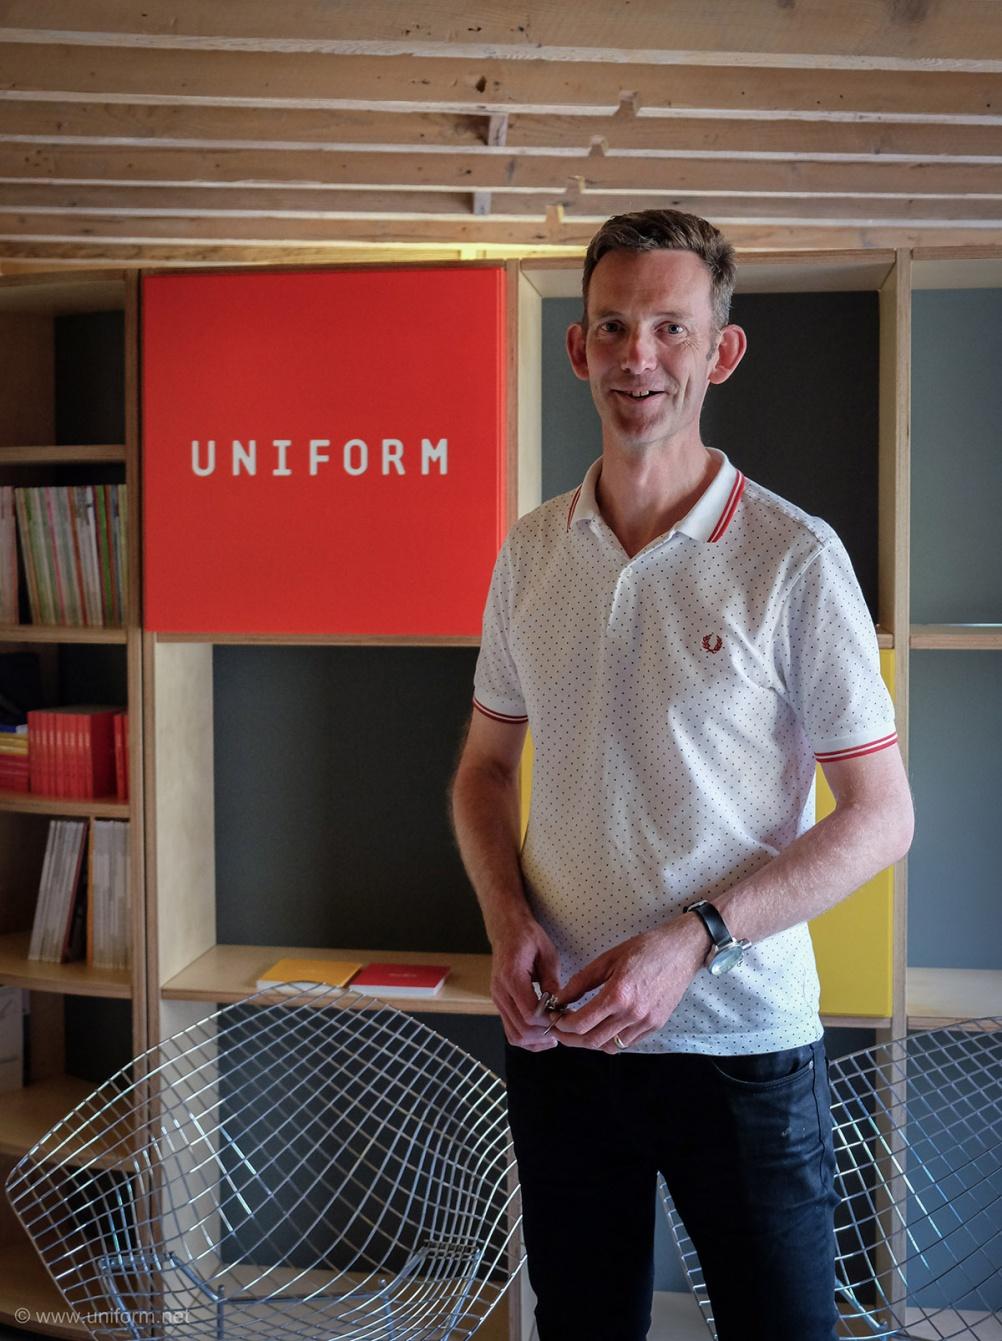 Ken Dixon, head of brand strategy, Uniform